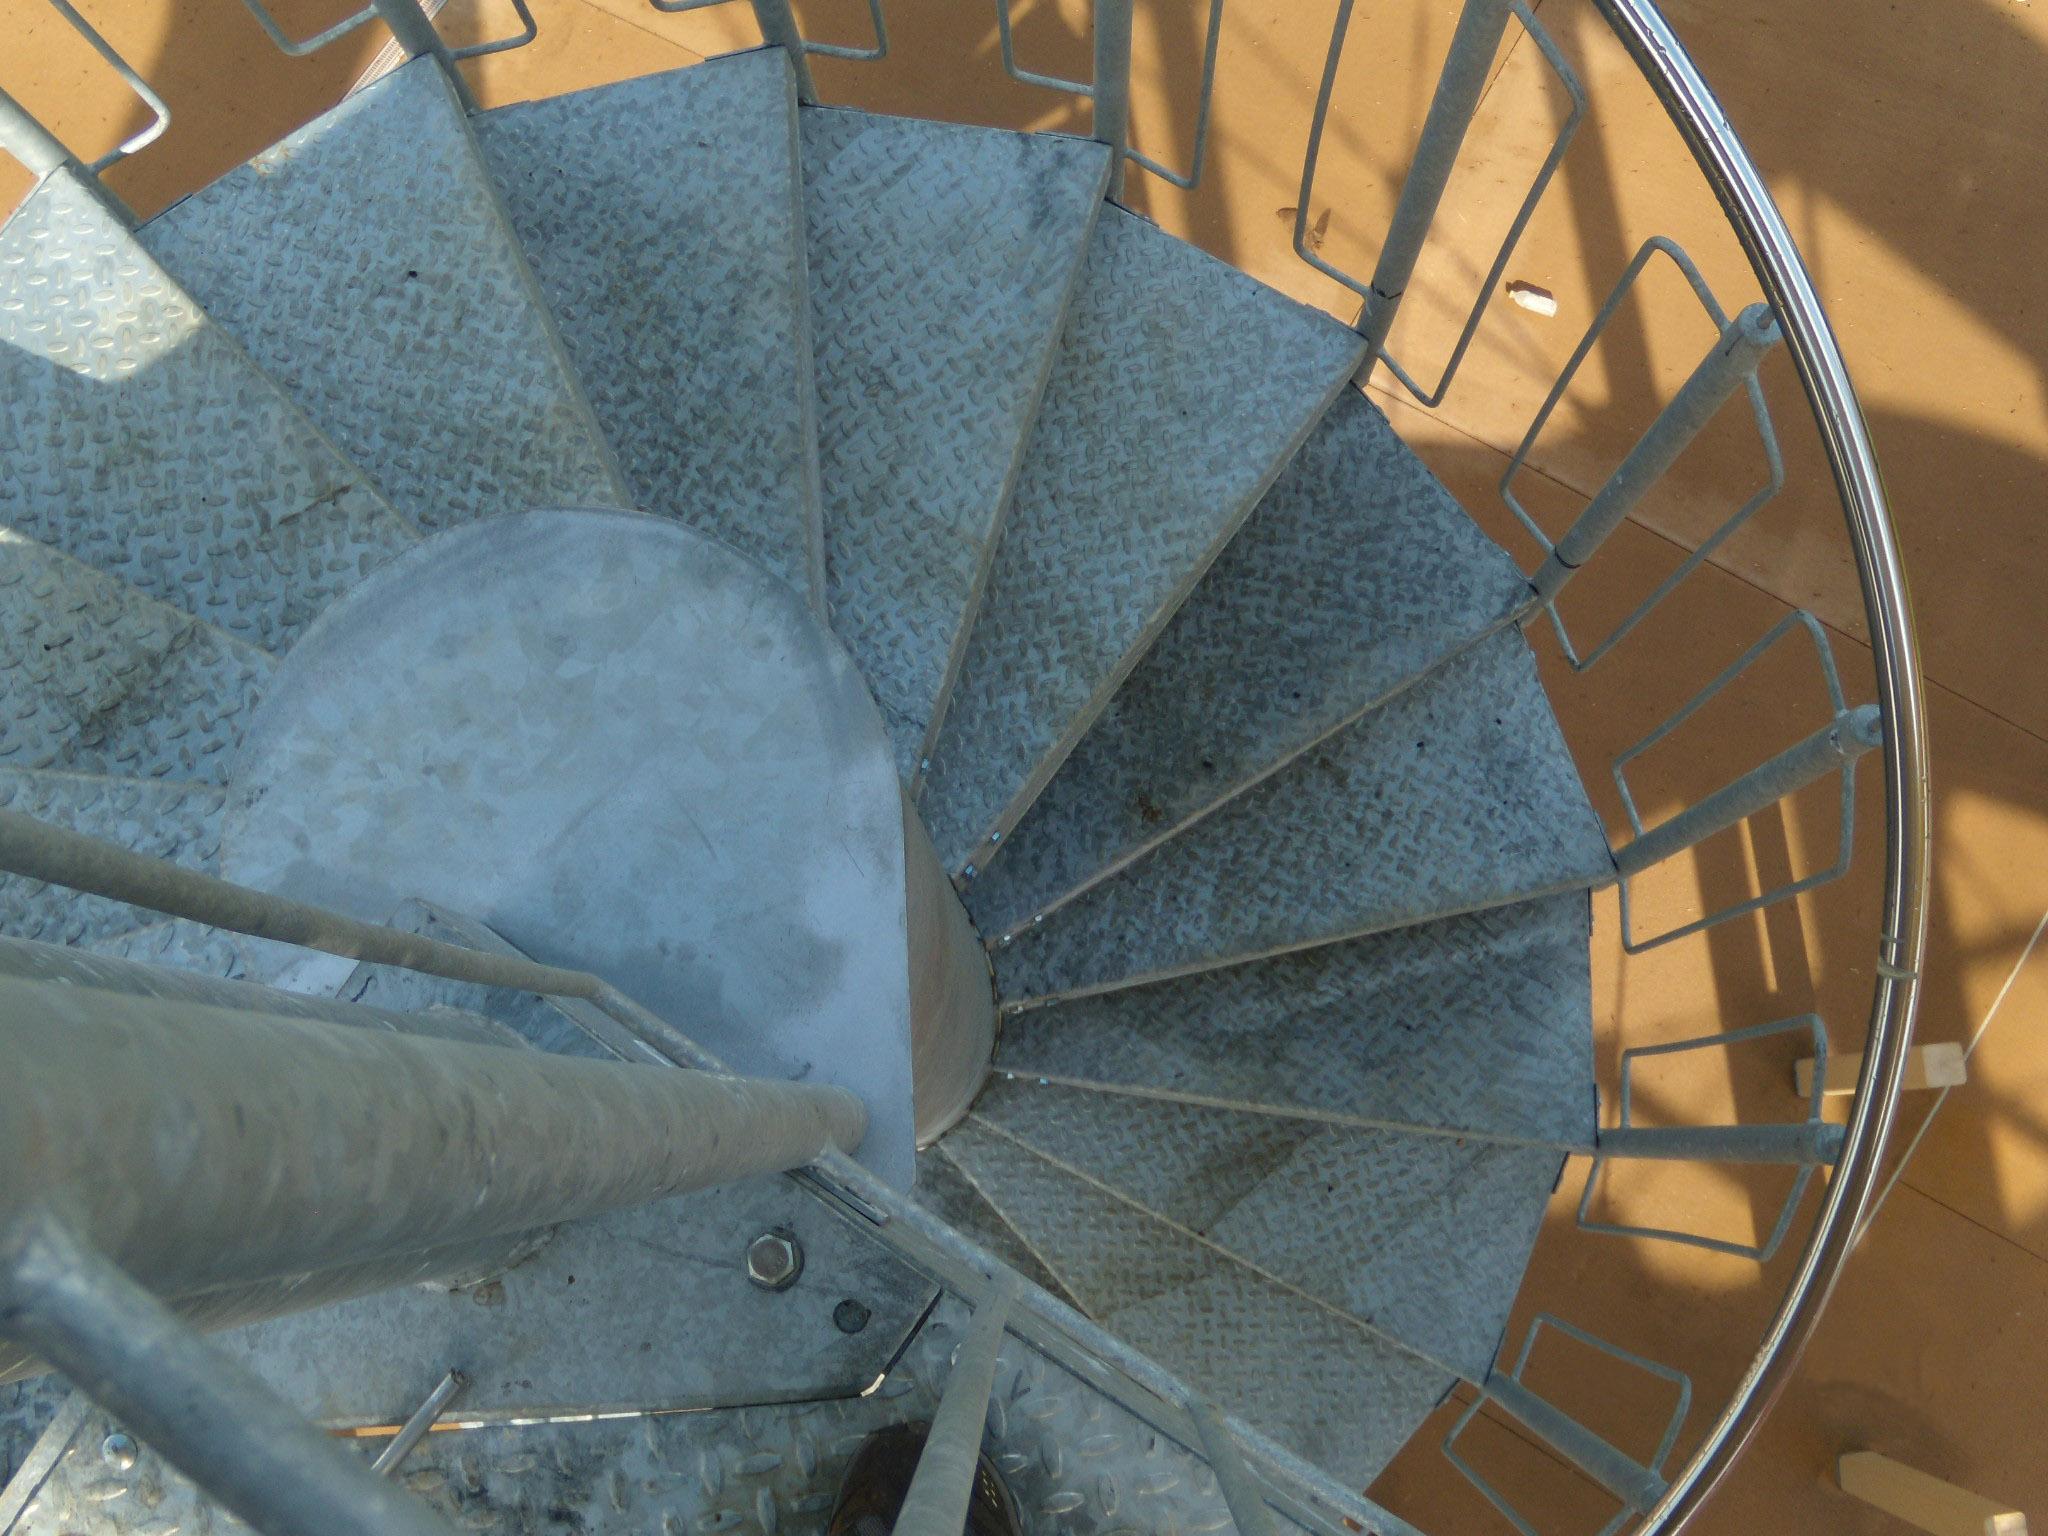 Metal spiral stair case